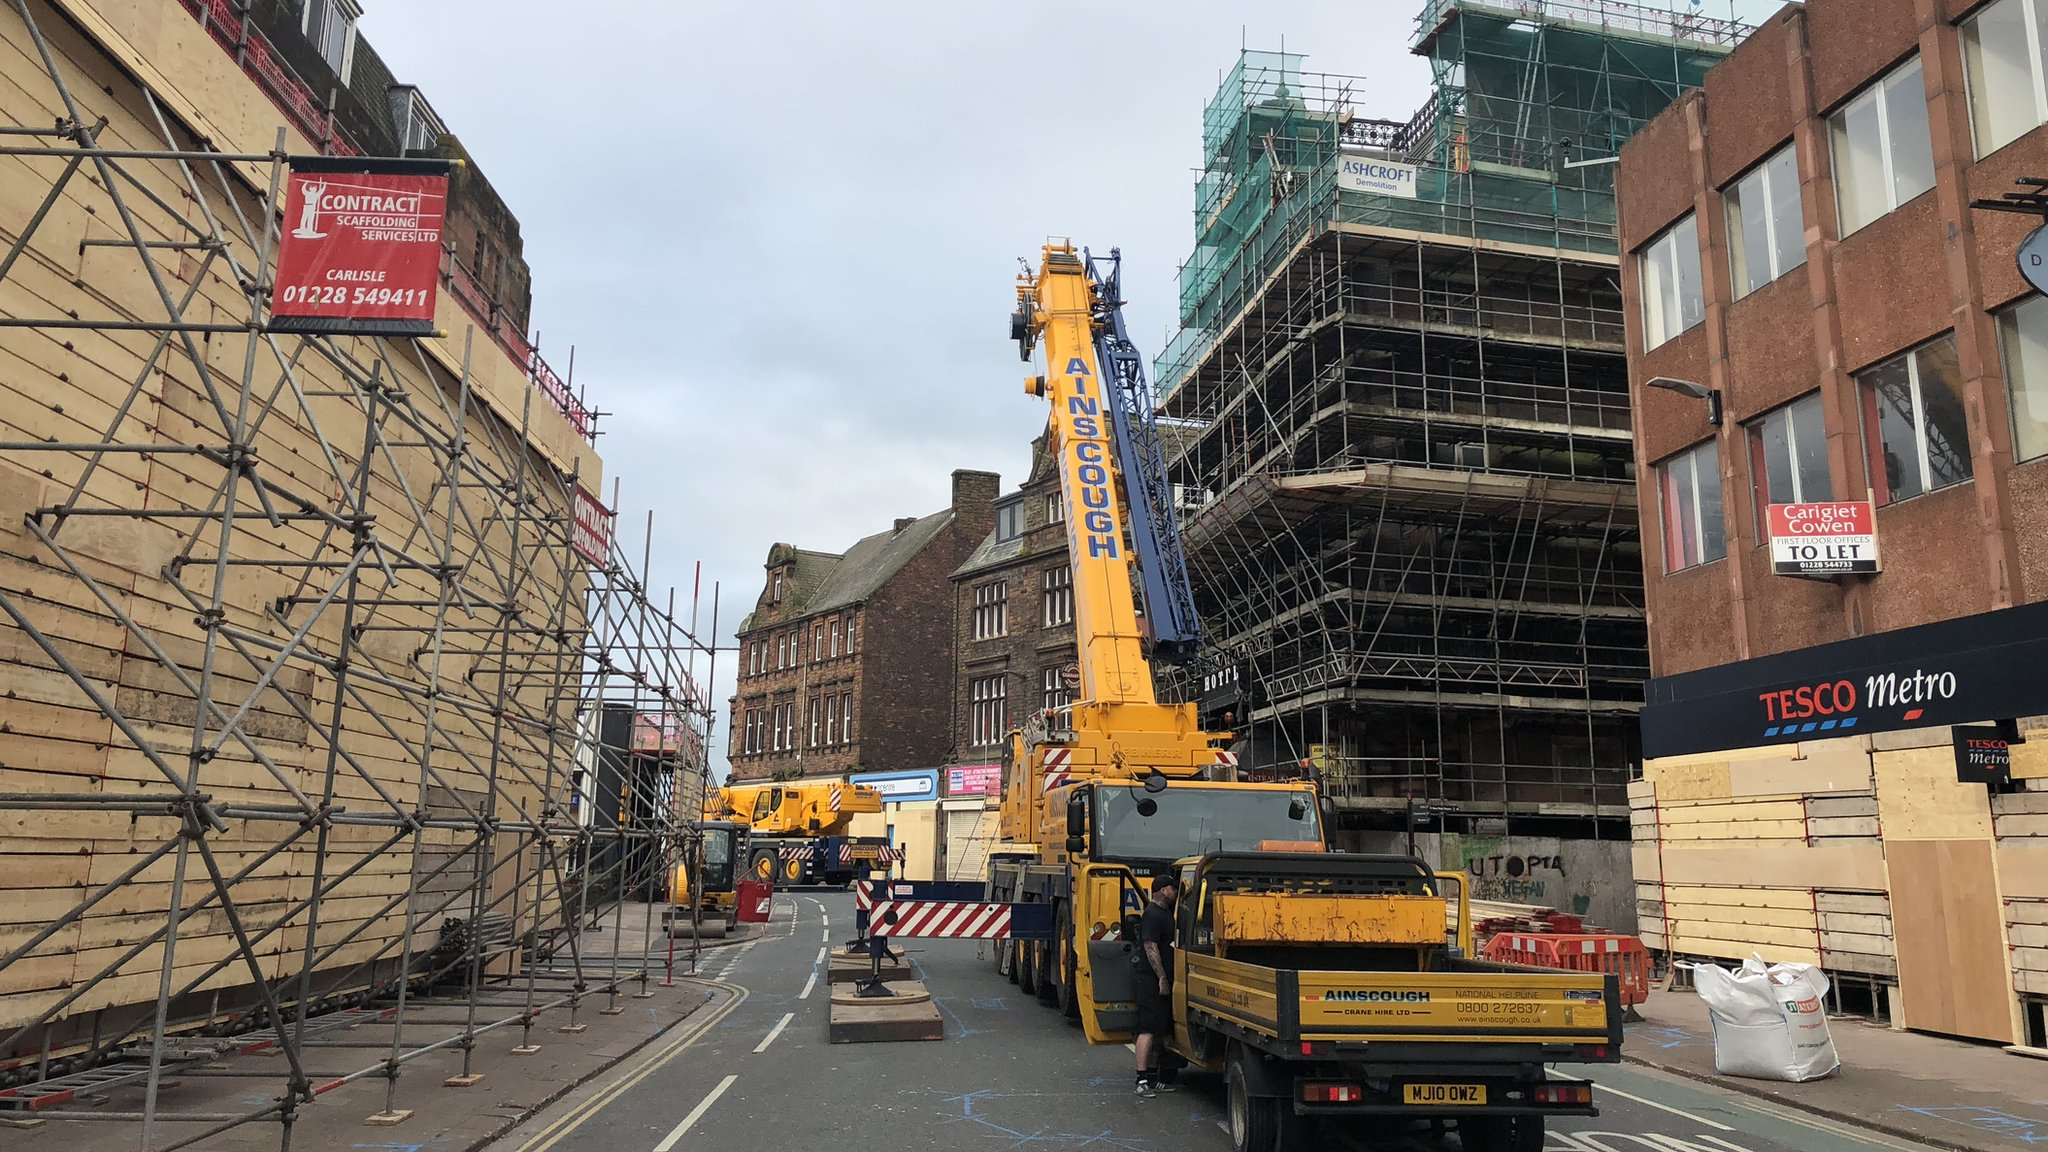 Carlisle councillors discuss future of derelict hotel